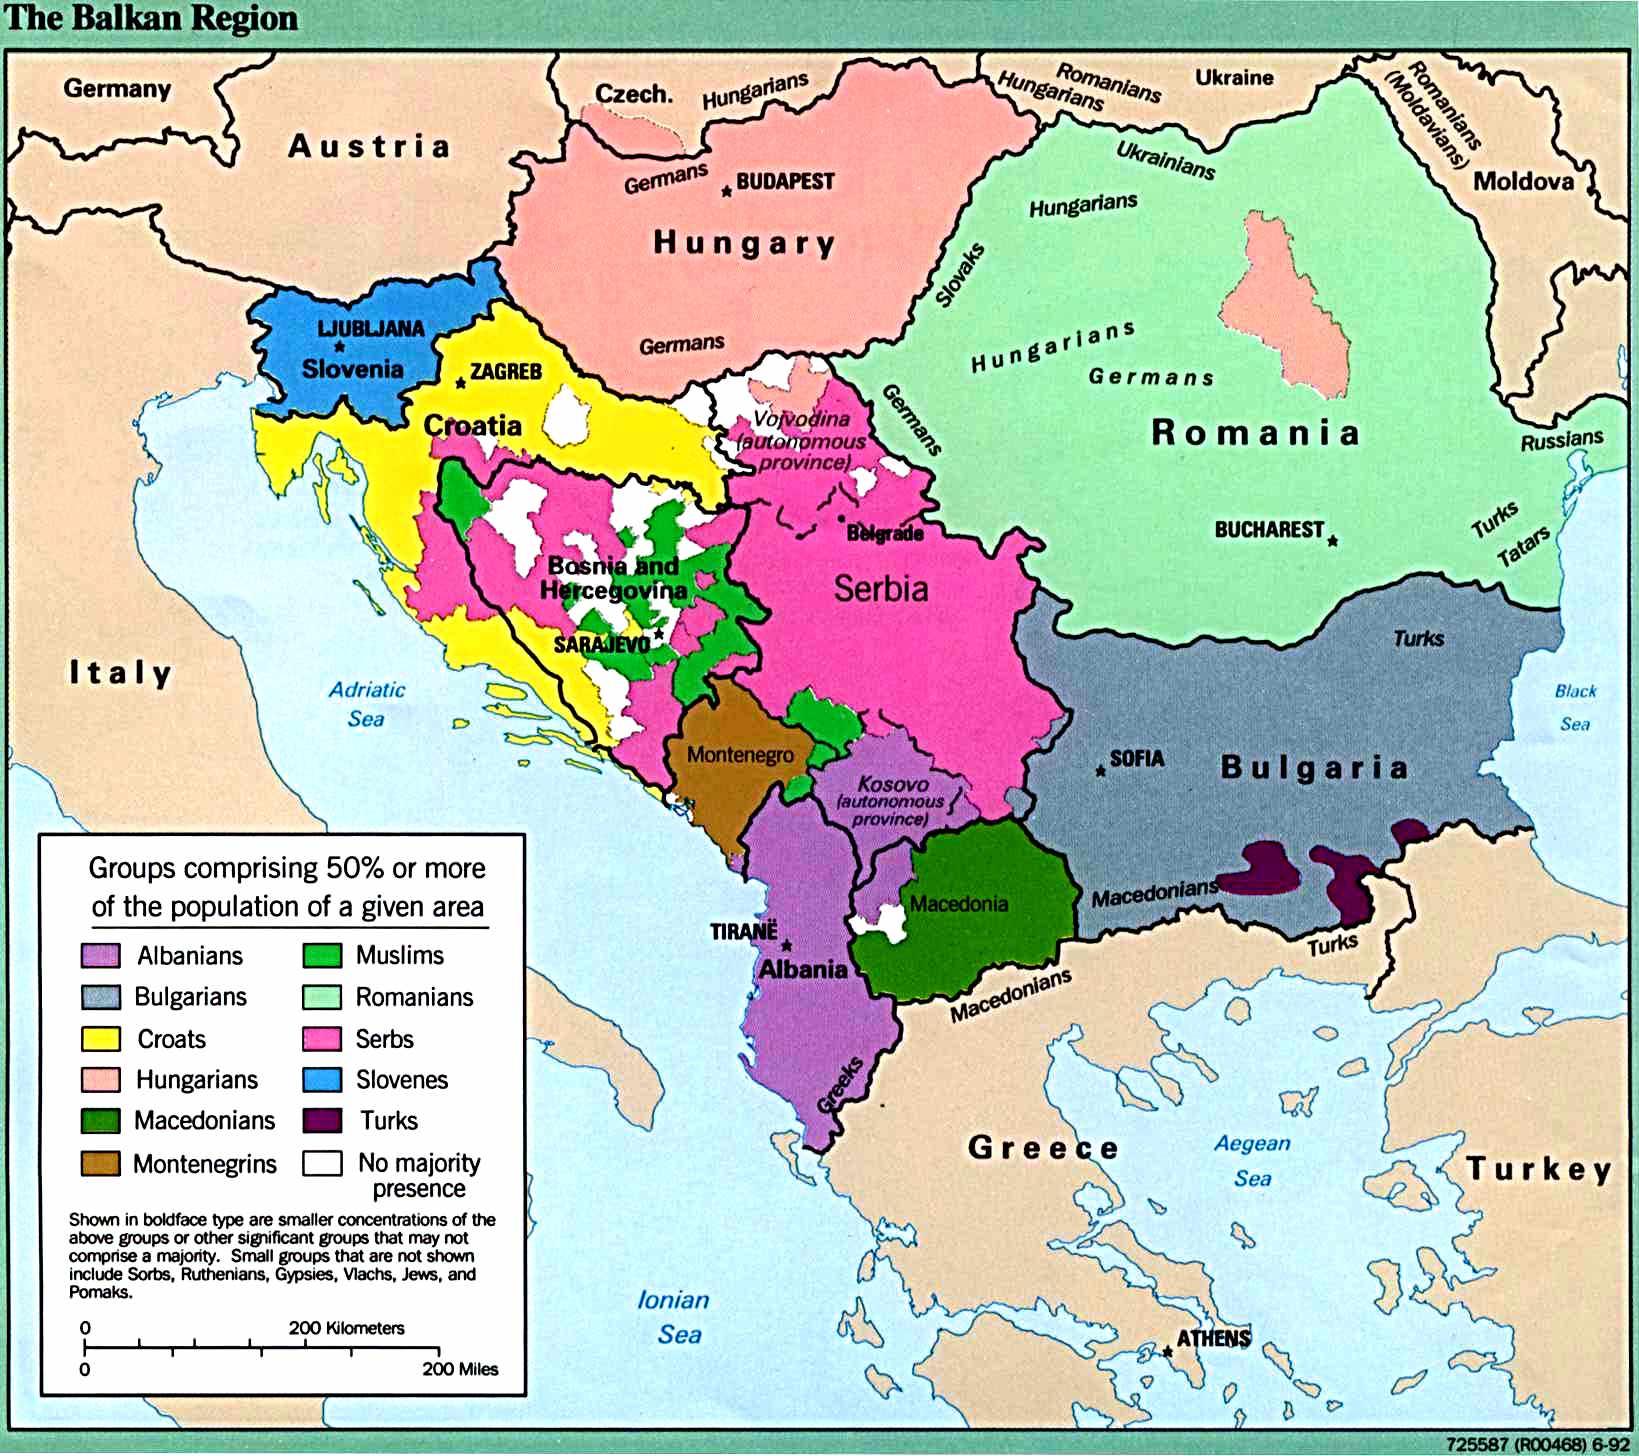 https://i2.wp.com/www.makedonija.info/CIA_Balkans.jpg